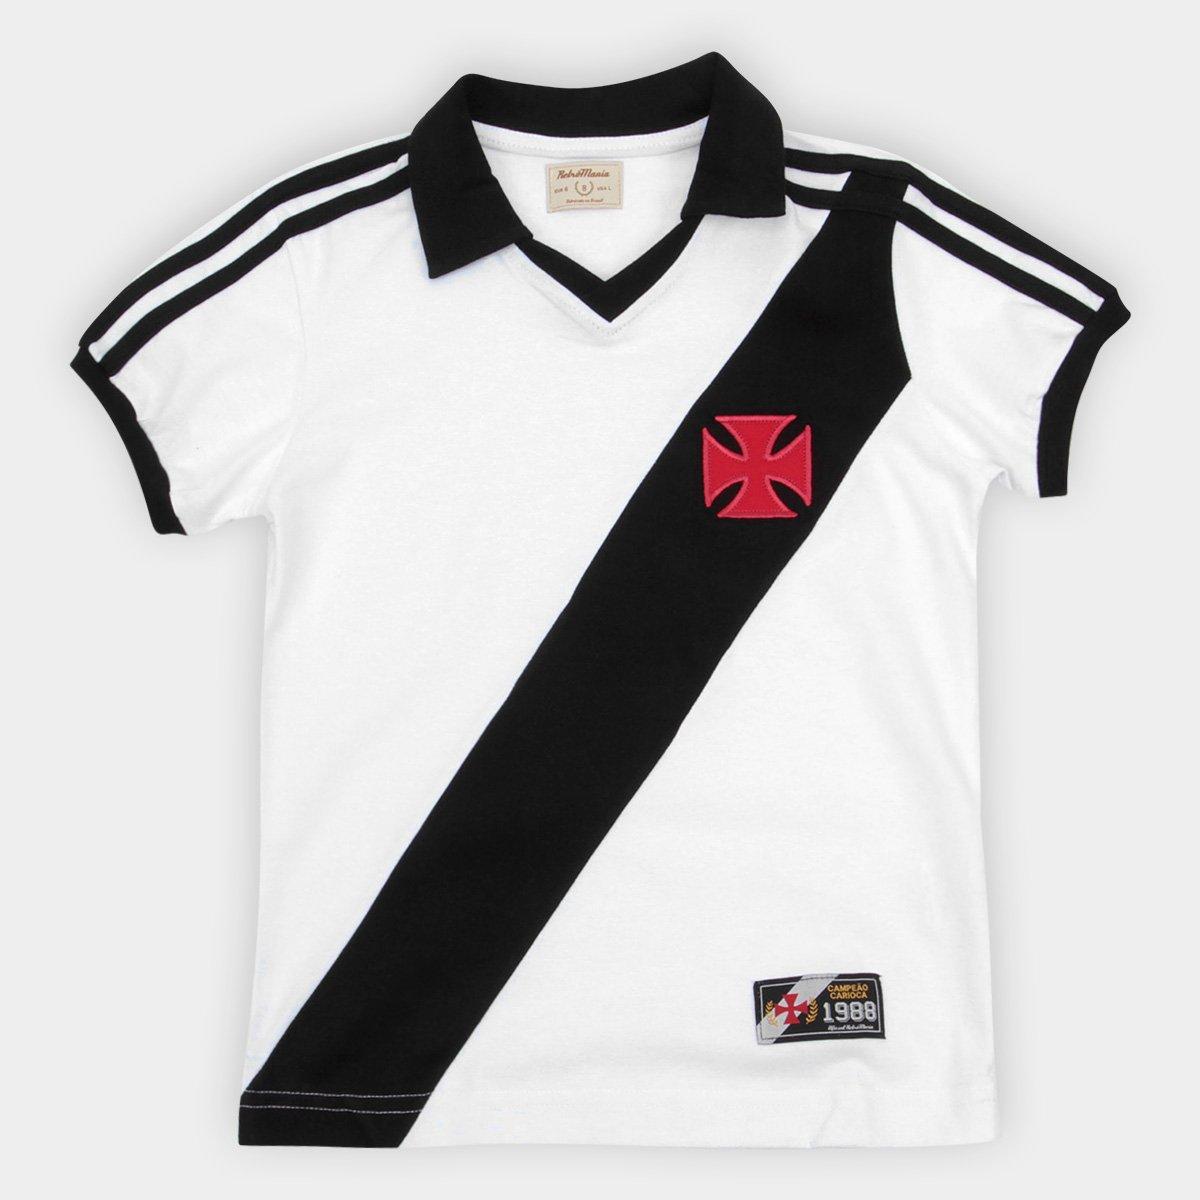 440434fbed Camiseta Vasco Juvenil Retrô Mania 1988 - Branco e Preto - Compre ...